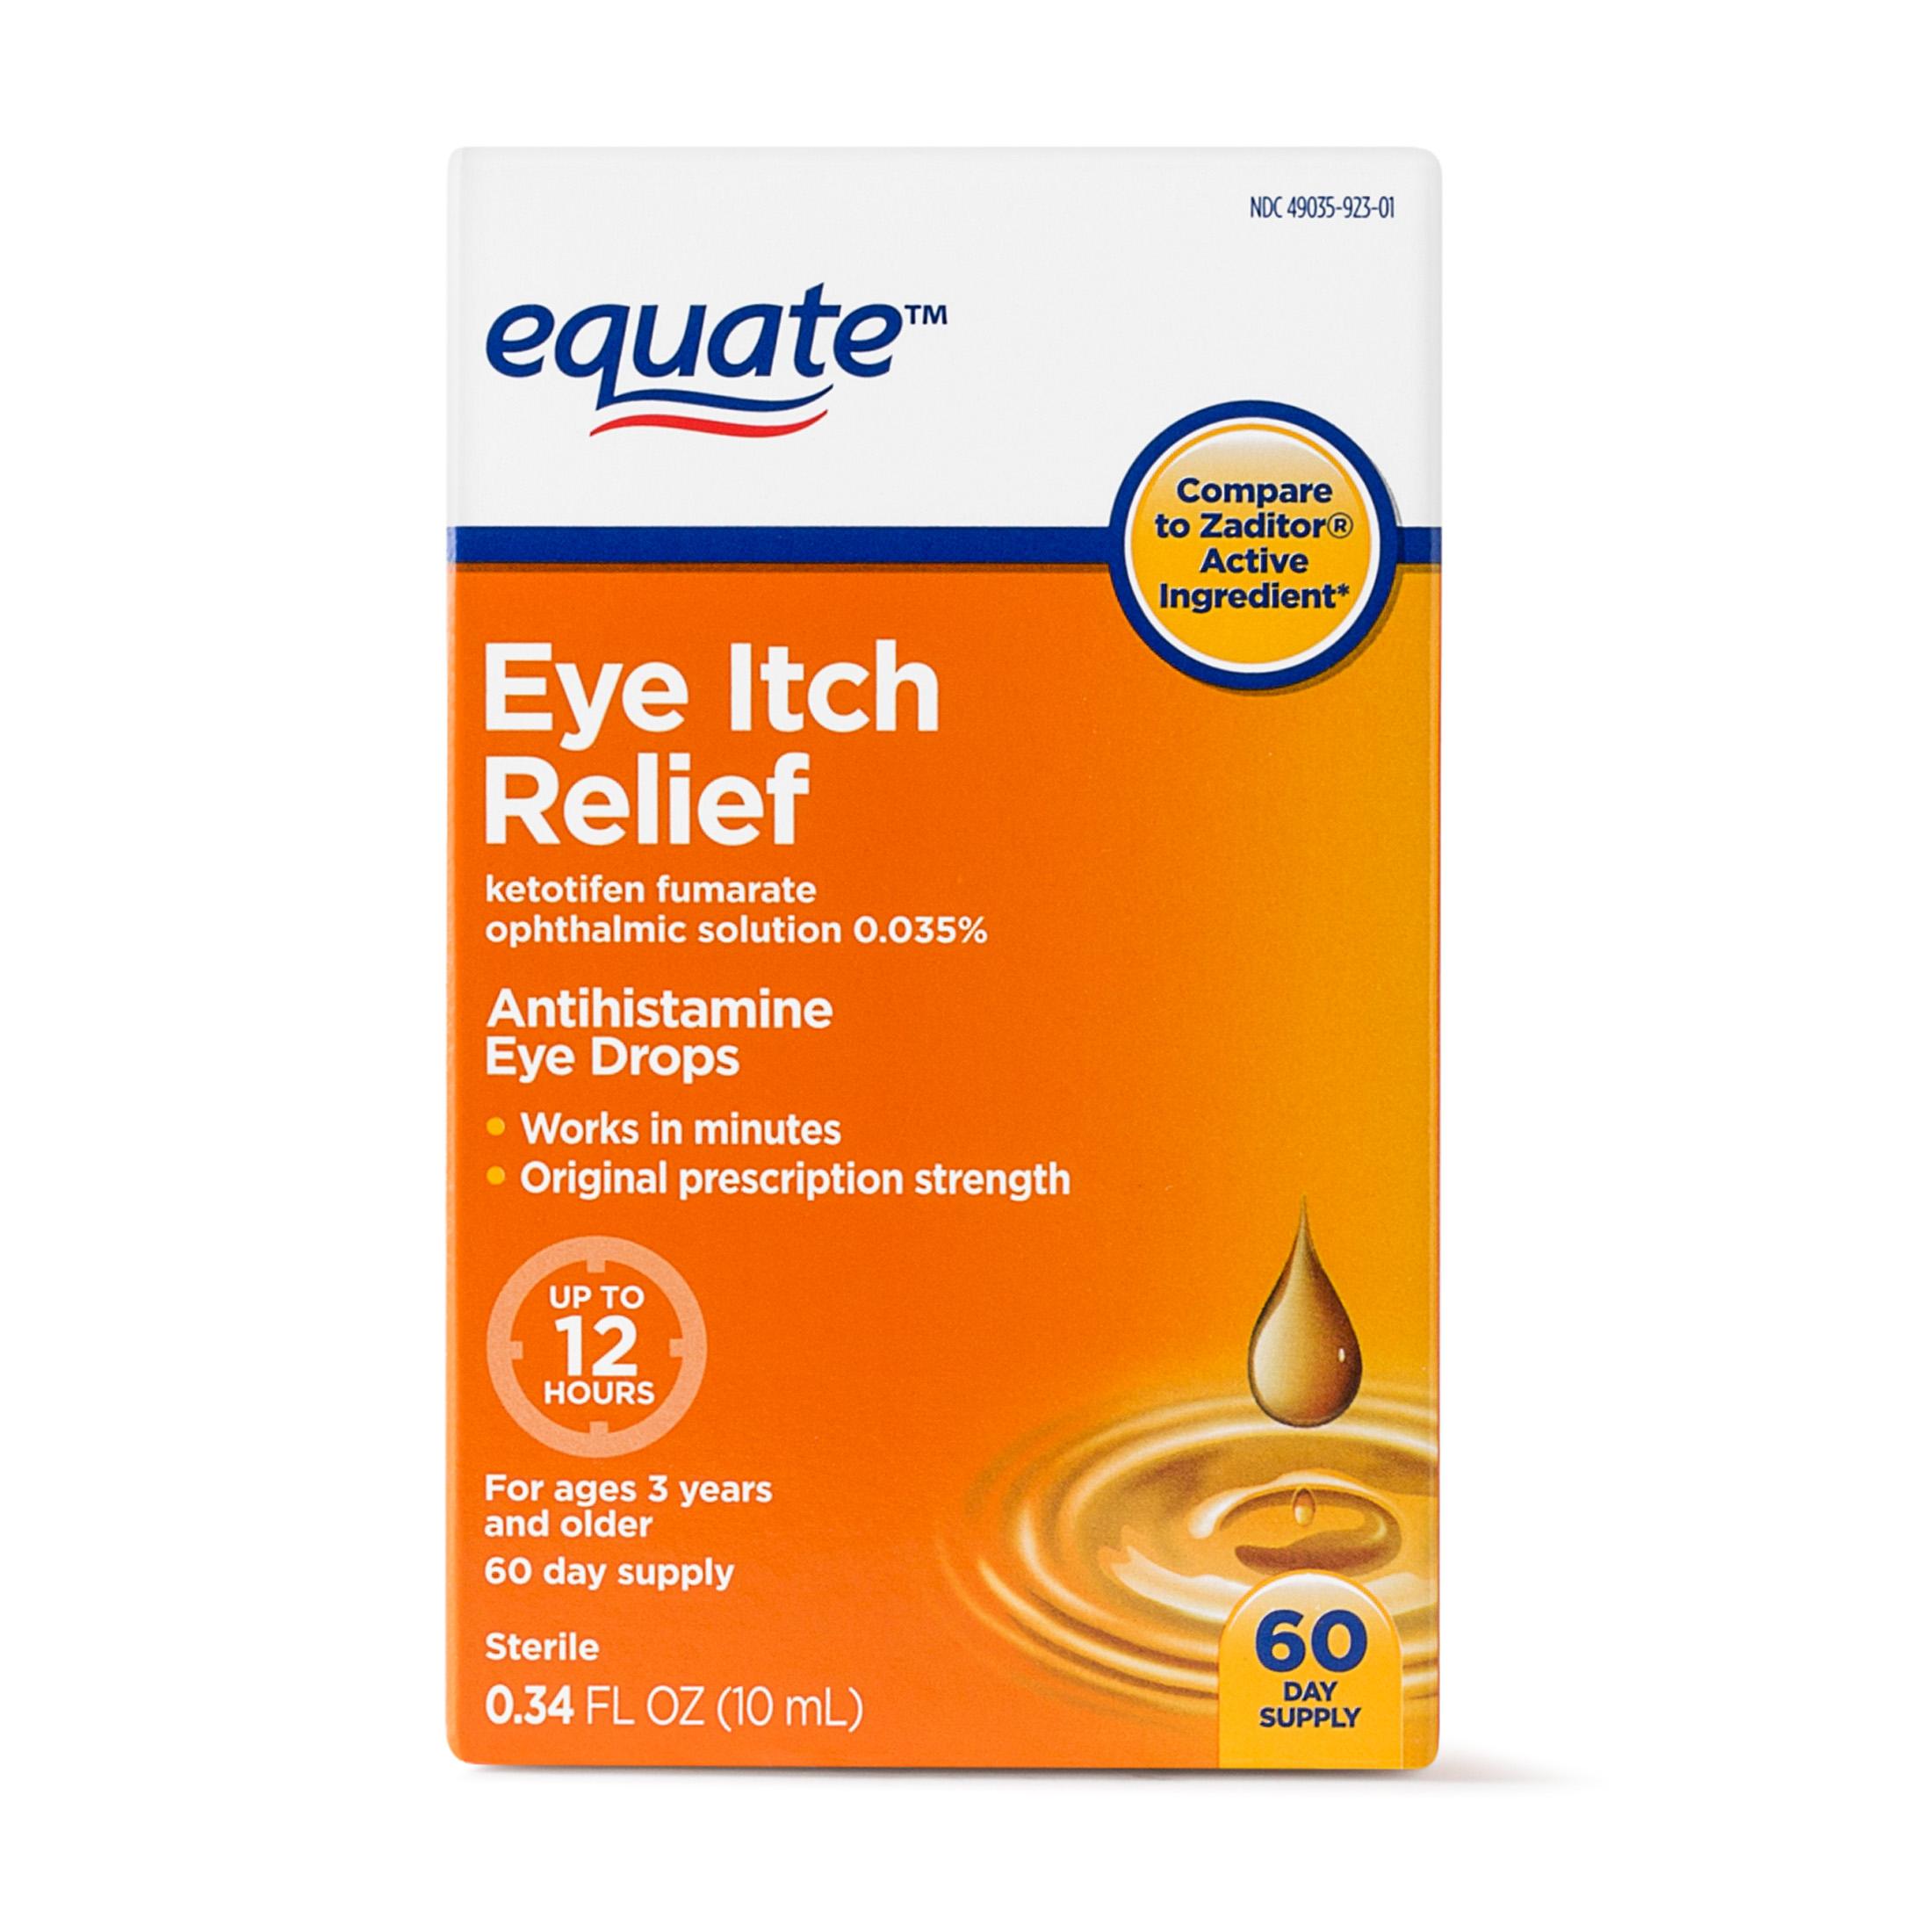 Equate Eye Itch Relief Antihistamine Eyedrops, 60 Ct, 0.34 Oz